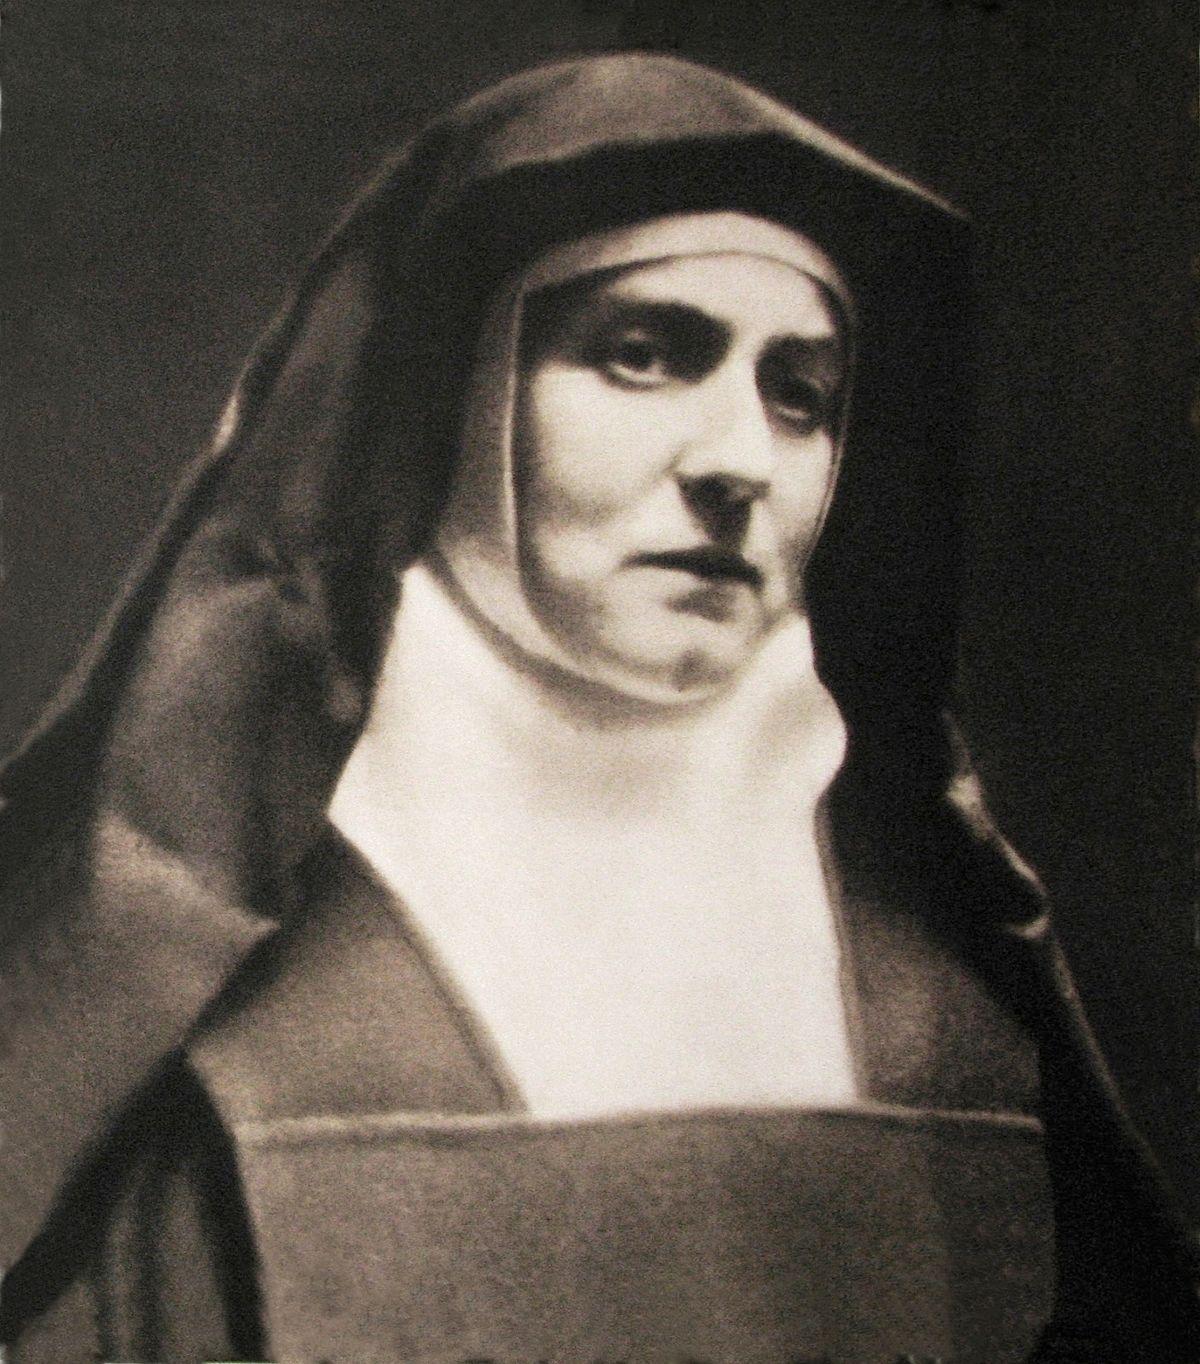 75. Todestag von Sr. Teresia Benedicta a Cruce (Edith Stein)